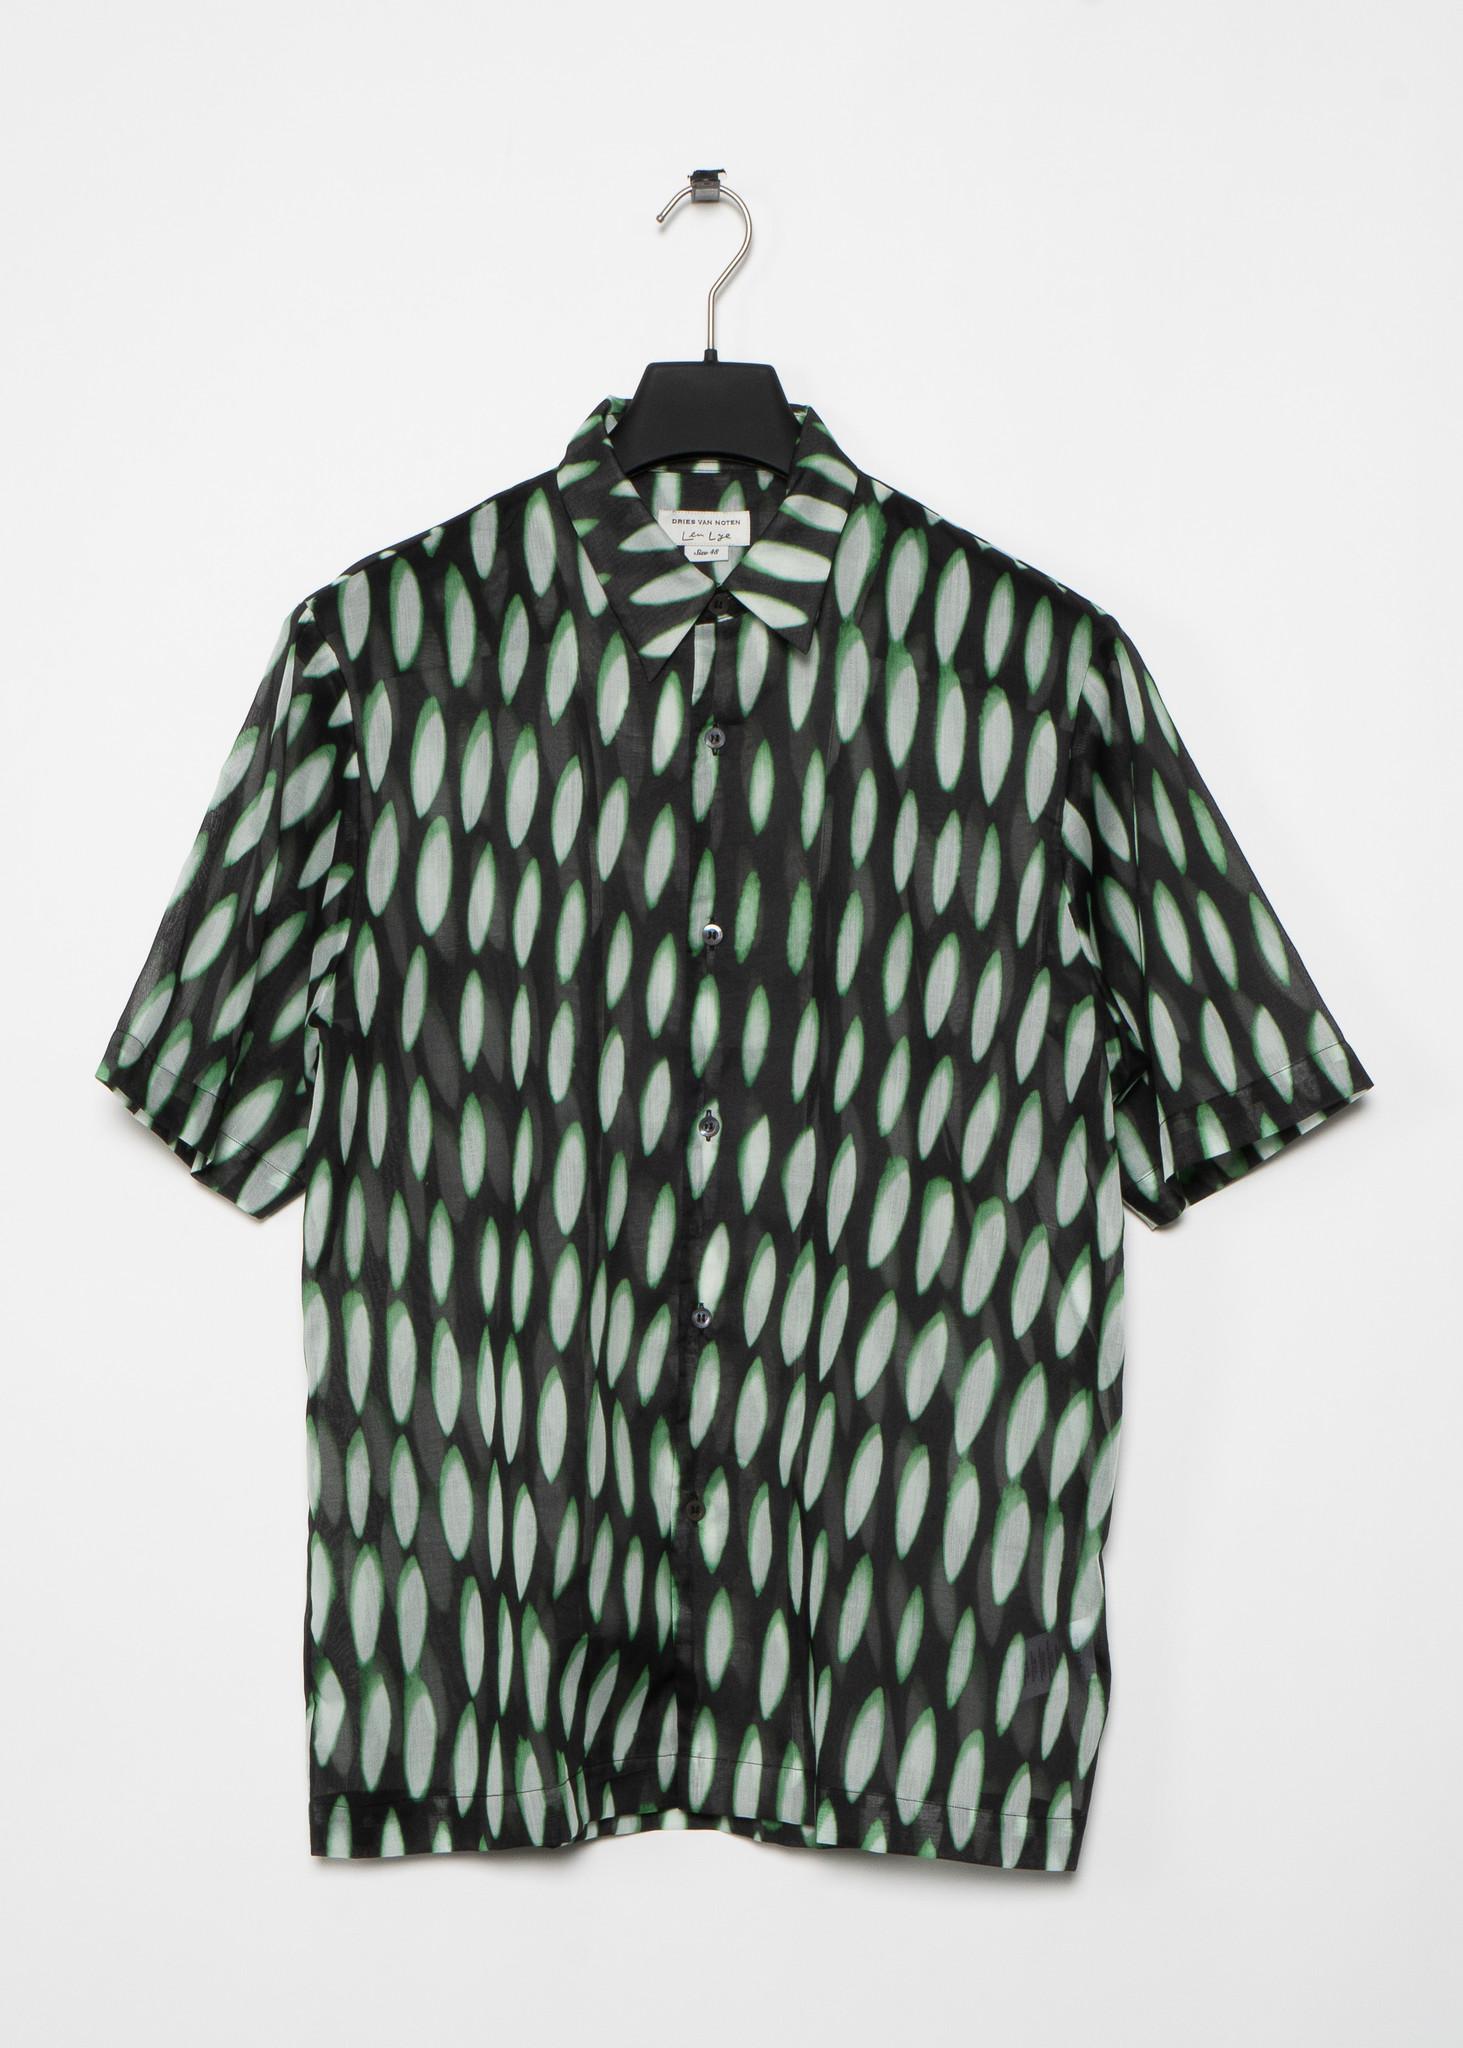 Black and Green Pattern Shirt